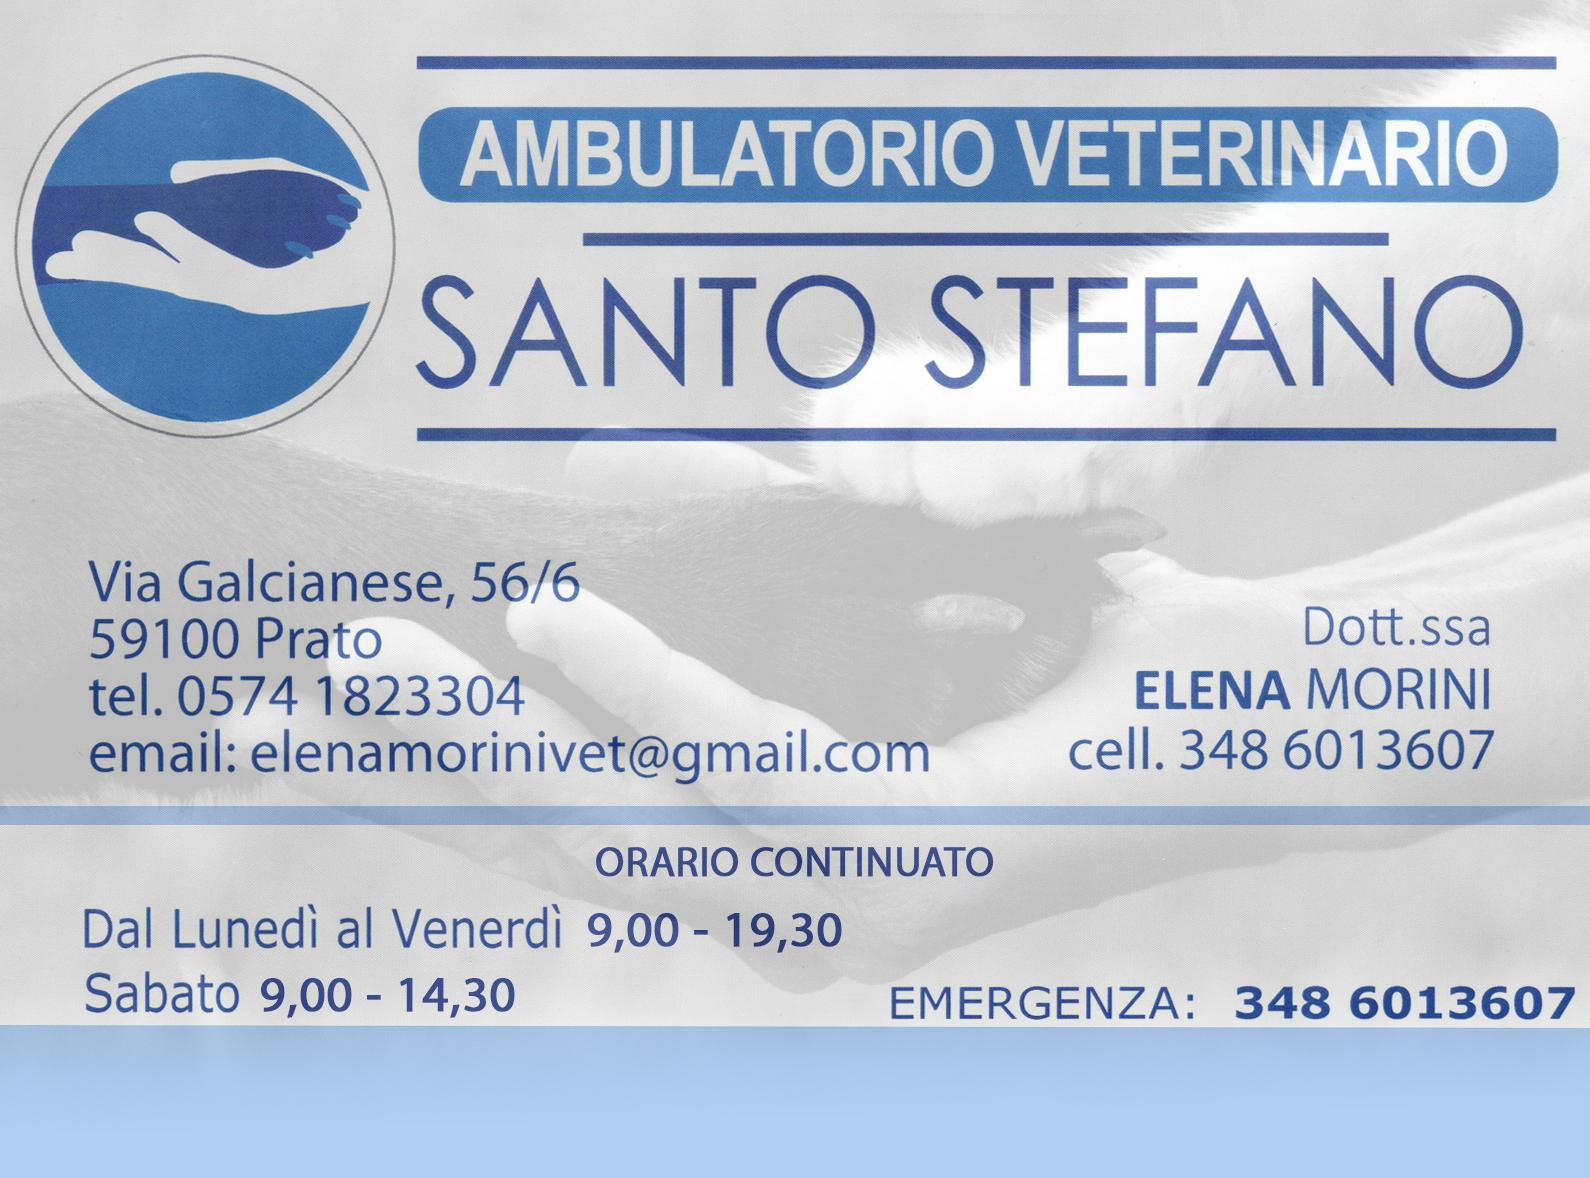 SANTO STEFANO 2